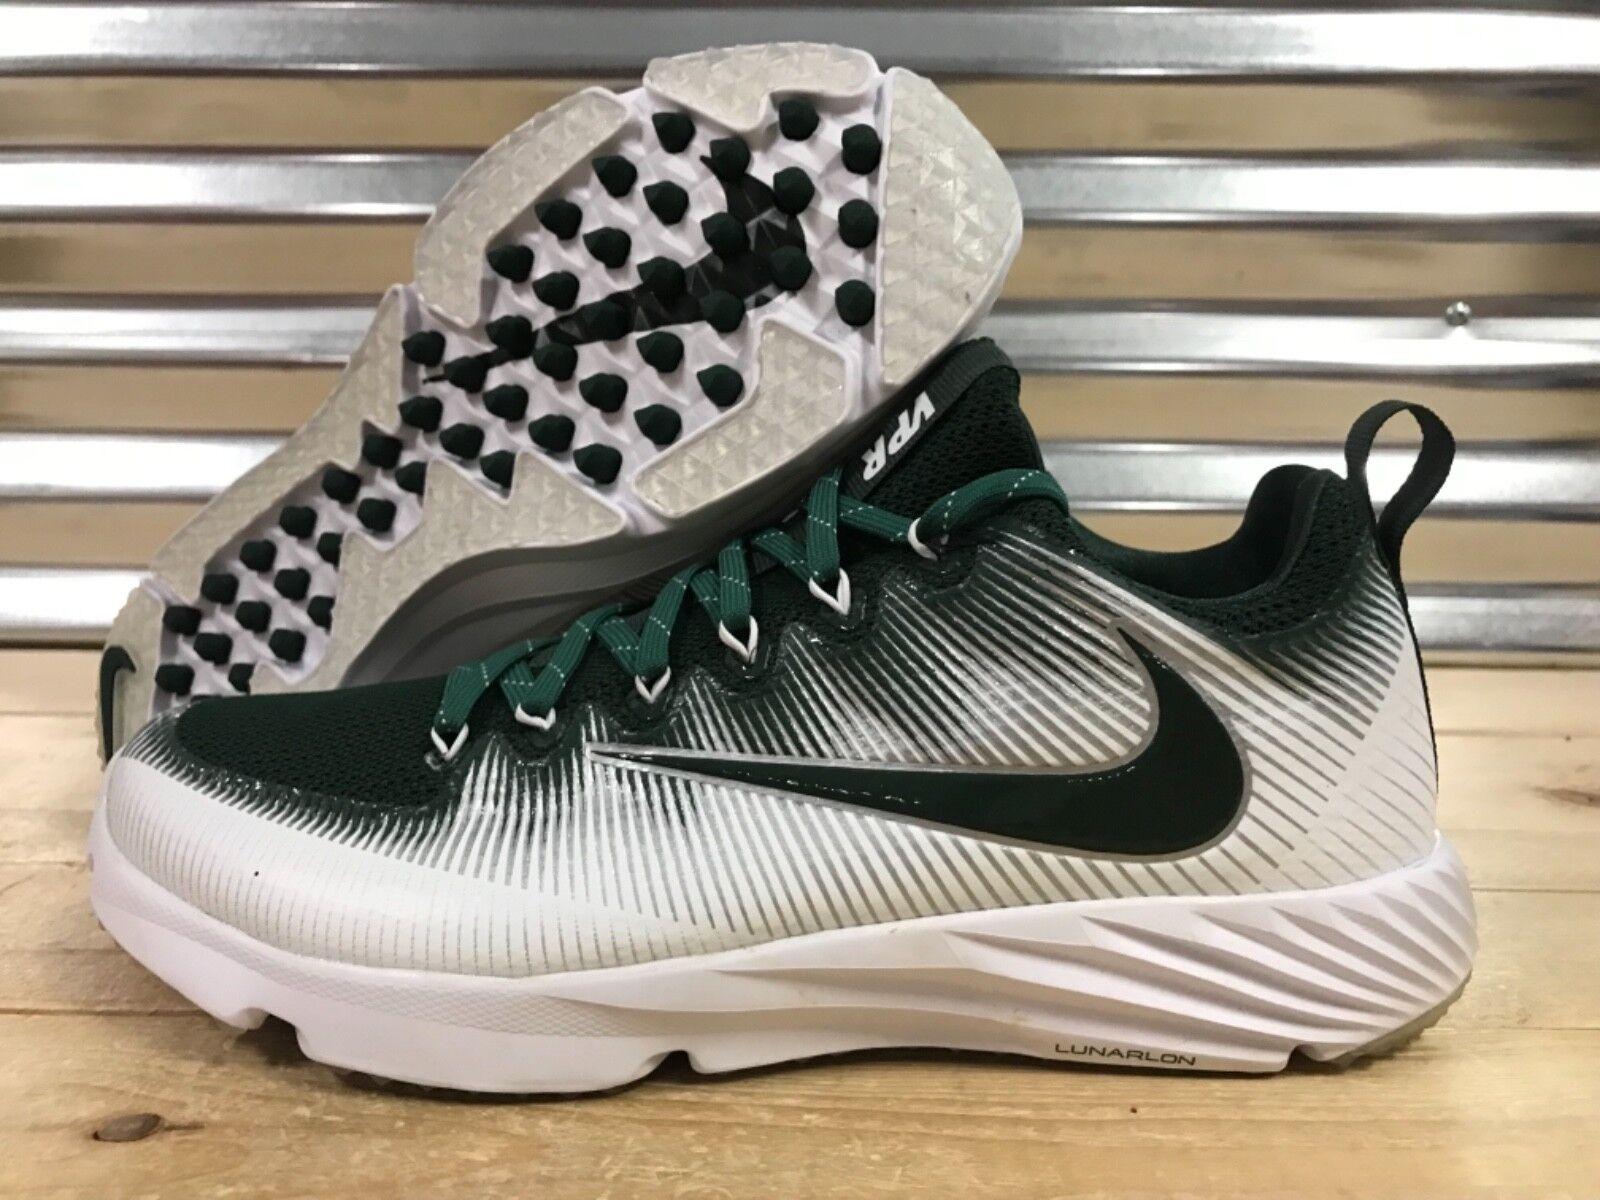 Nike Vapor Speed Turf CF Football Trainer Scarpe Green White SZ ( 848334-331 )